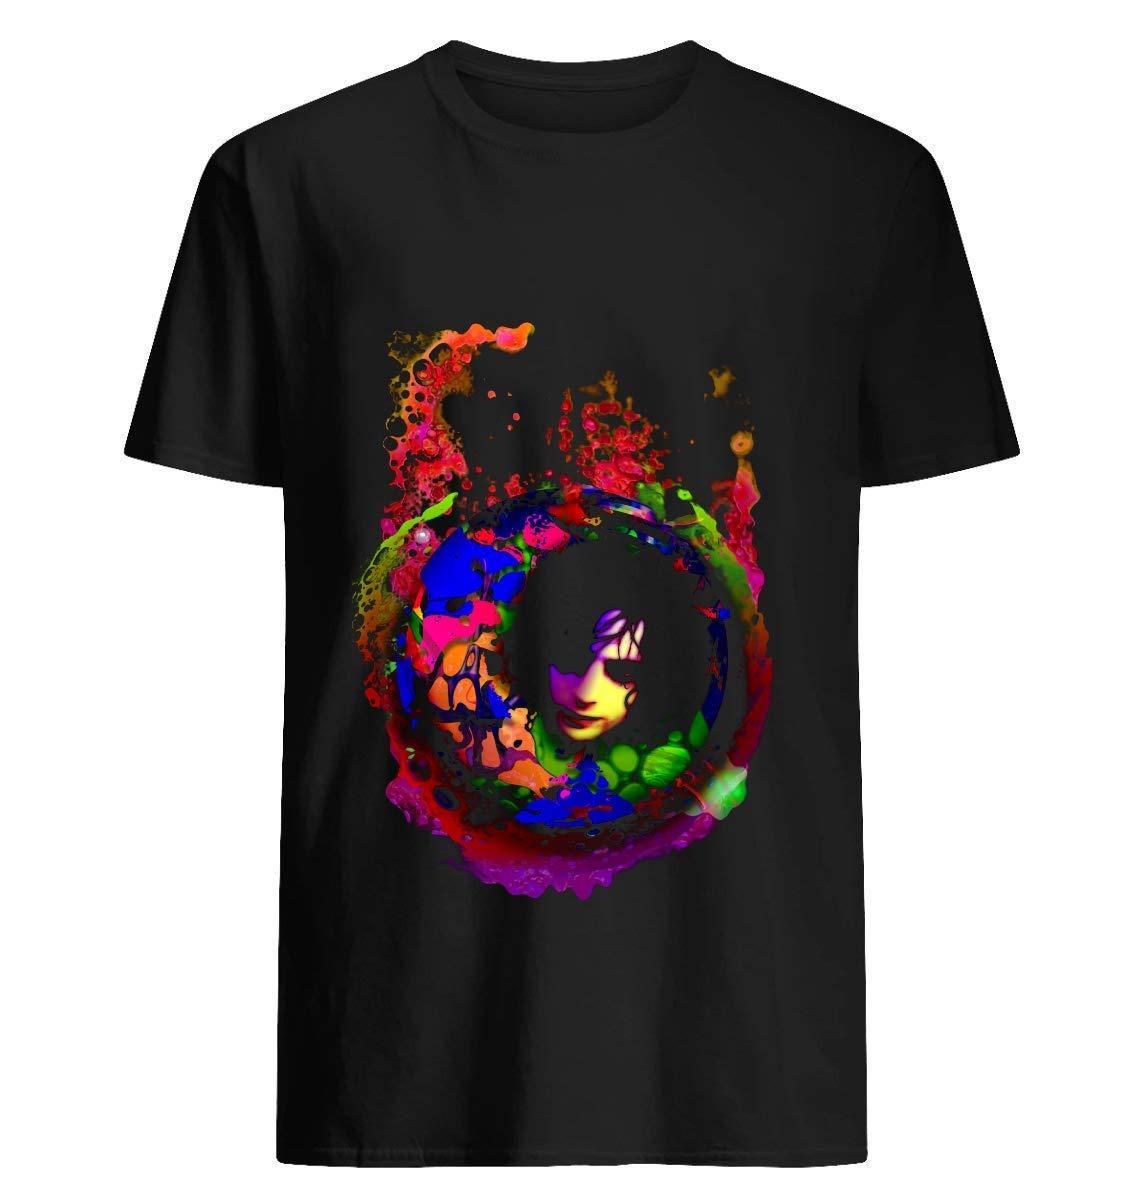 Asyd T Shirt 40 T Shirt For Unisex